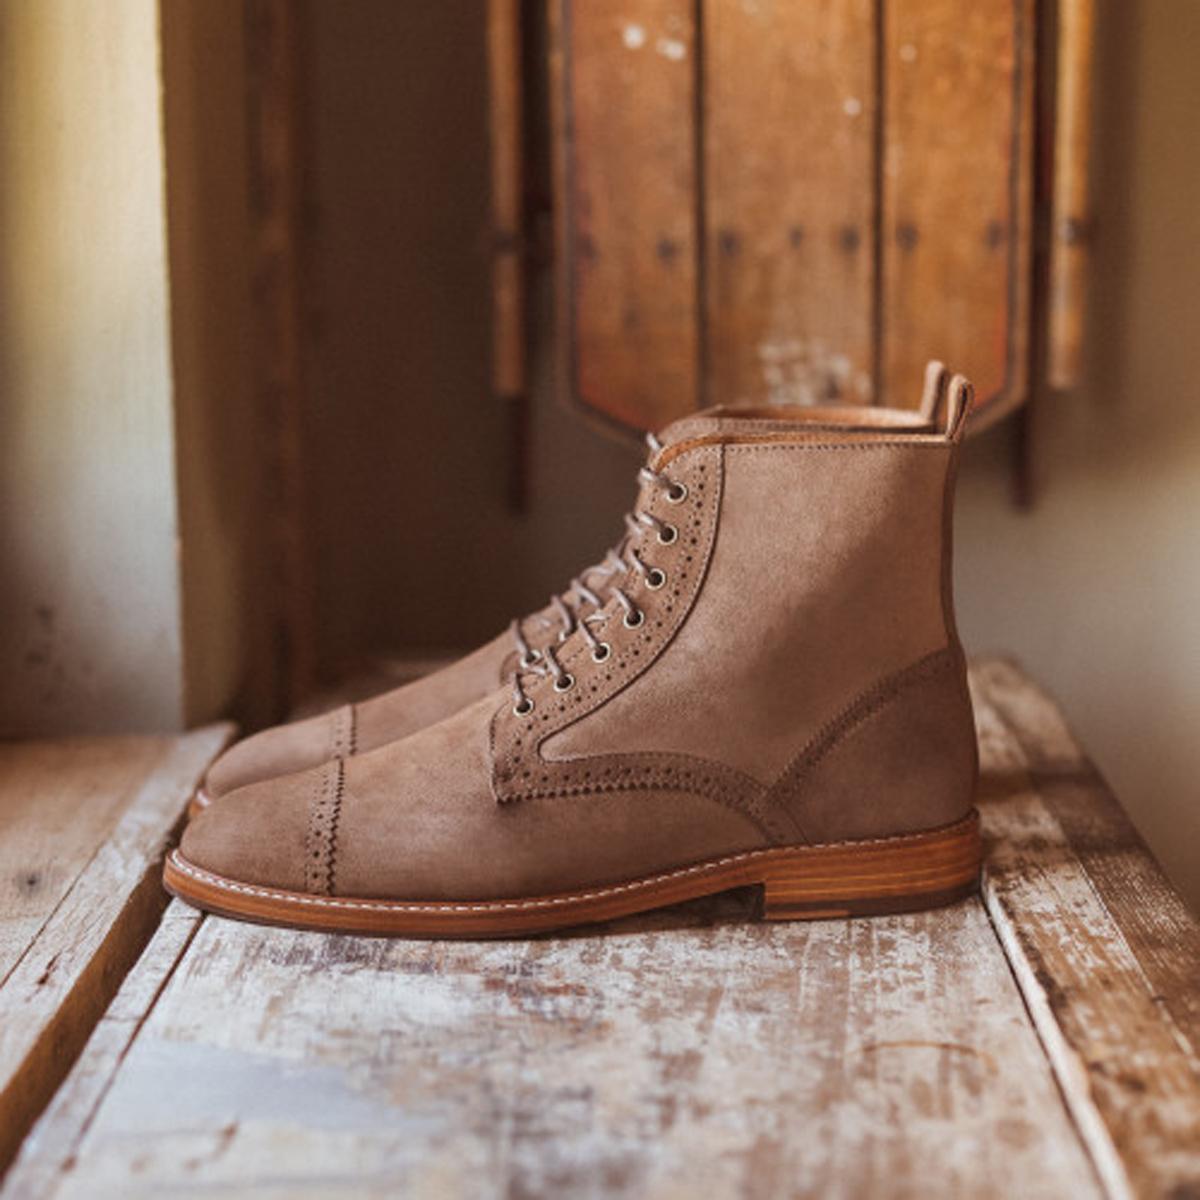 Leather High Boots Le Bon Vivant Le Bon Vivant   Upp till 70